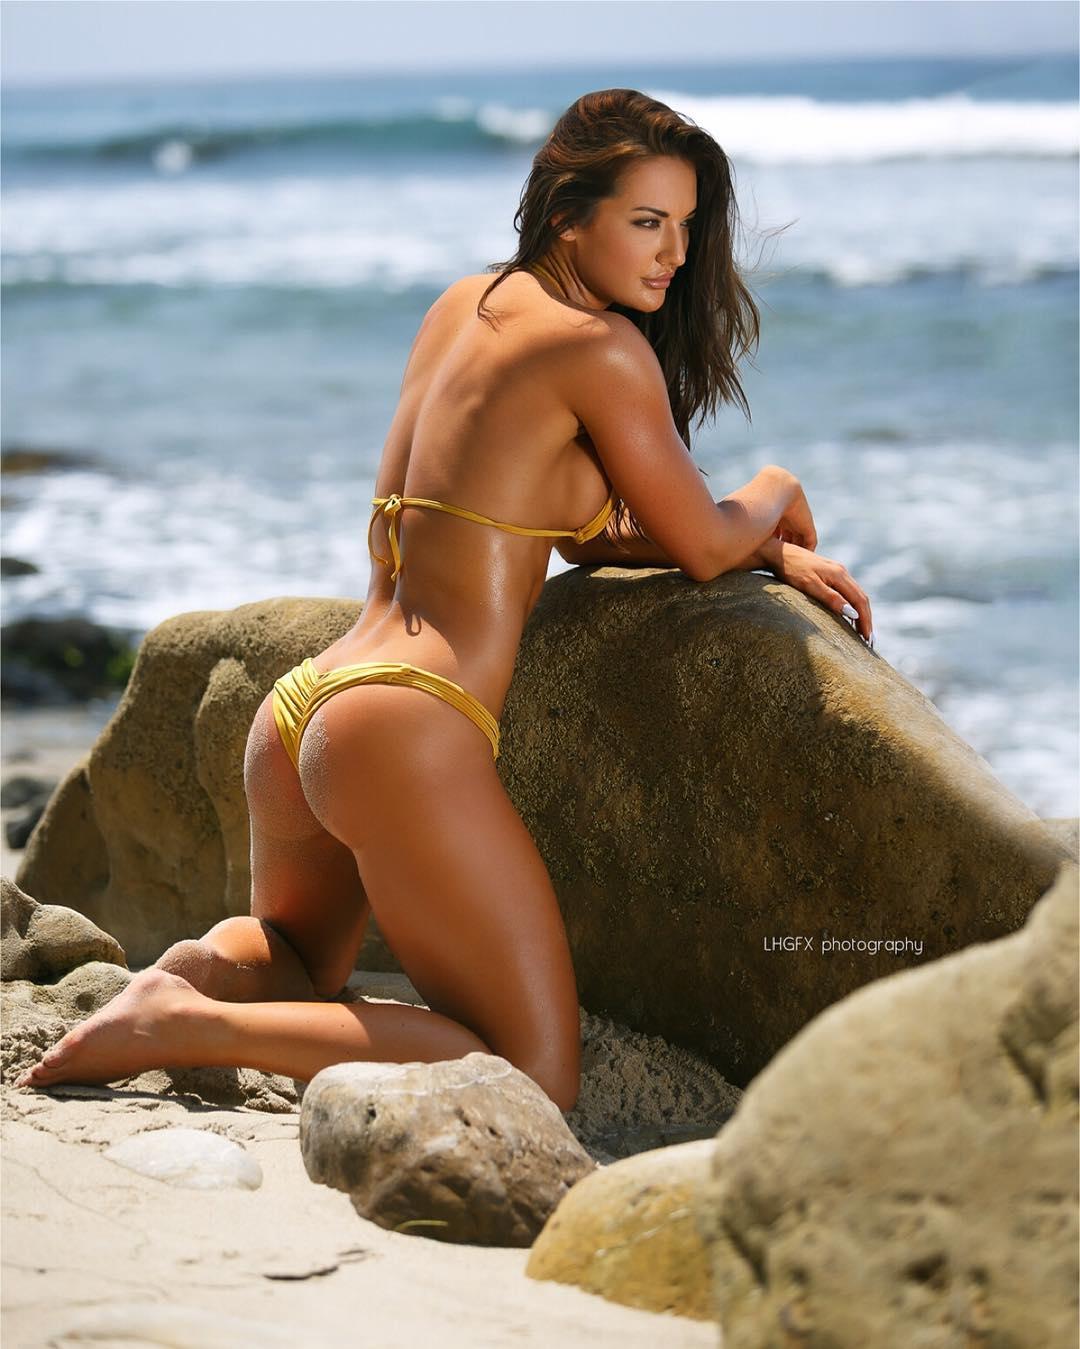 Bfit blonde bikini models